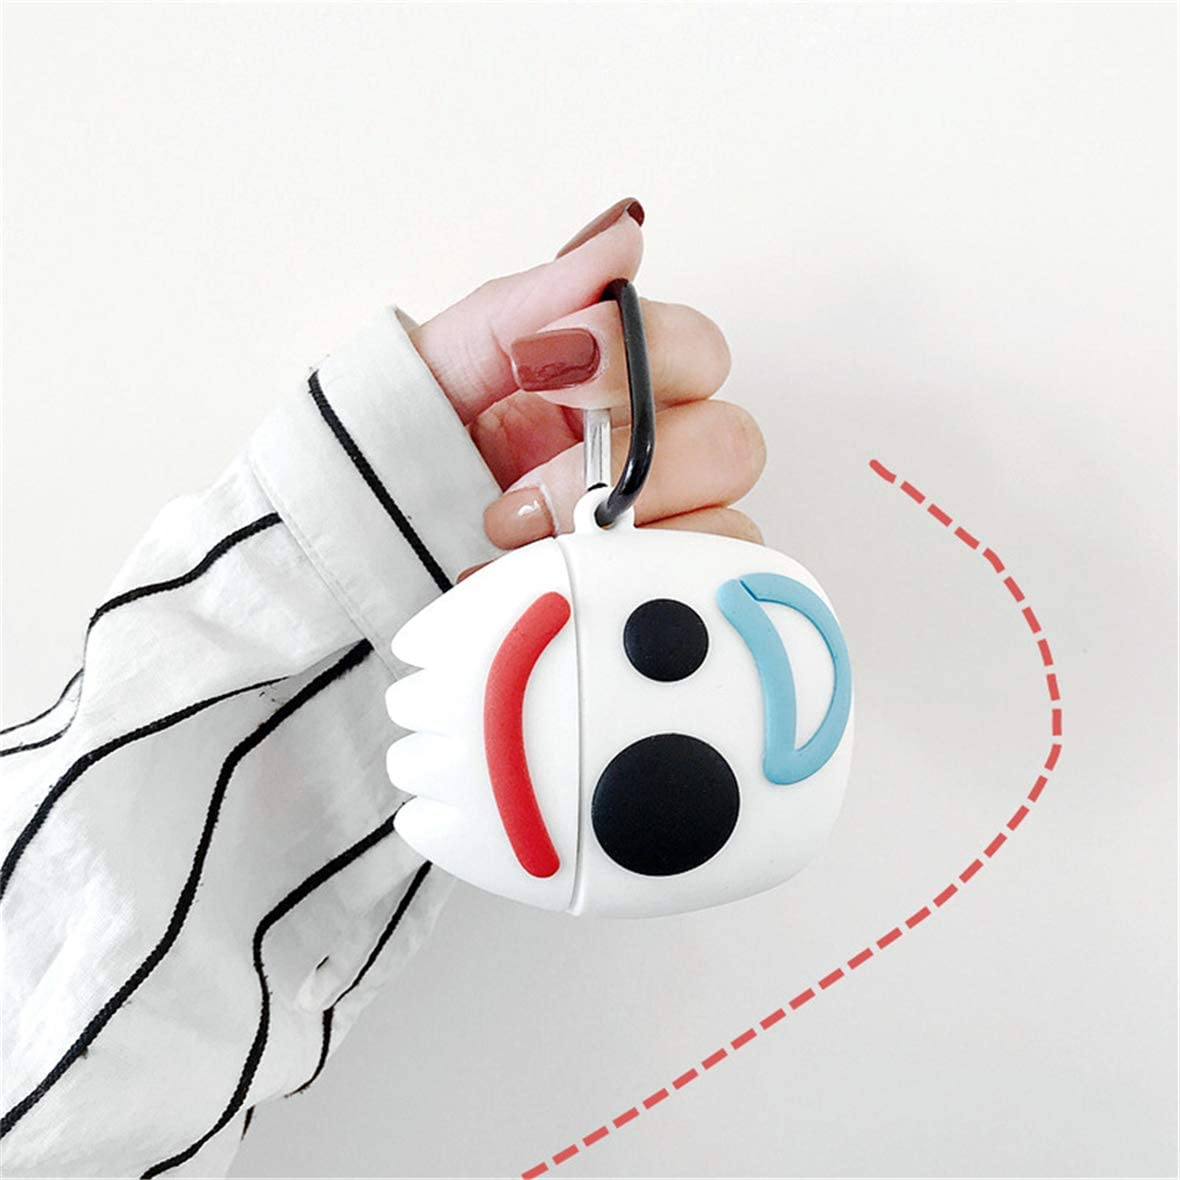 Funda para AirPods 2nd 1st Protectora Silicona Suave AirPod 1/&2 Funda A Prueba de Golpes Dibujos Animados Lindo Piel Muchachas Mujer Ni/ños Dise/ño C/áscara Llavero Moda Gracioso Air Pods Casos 3D